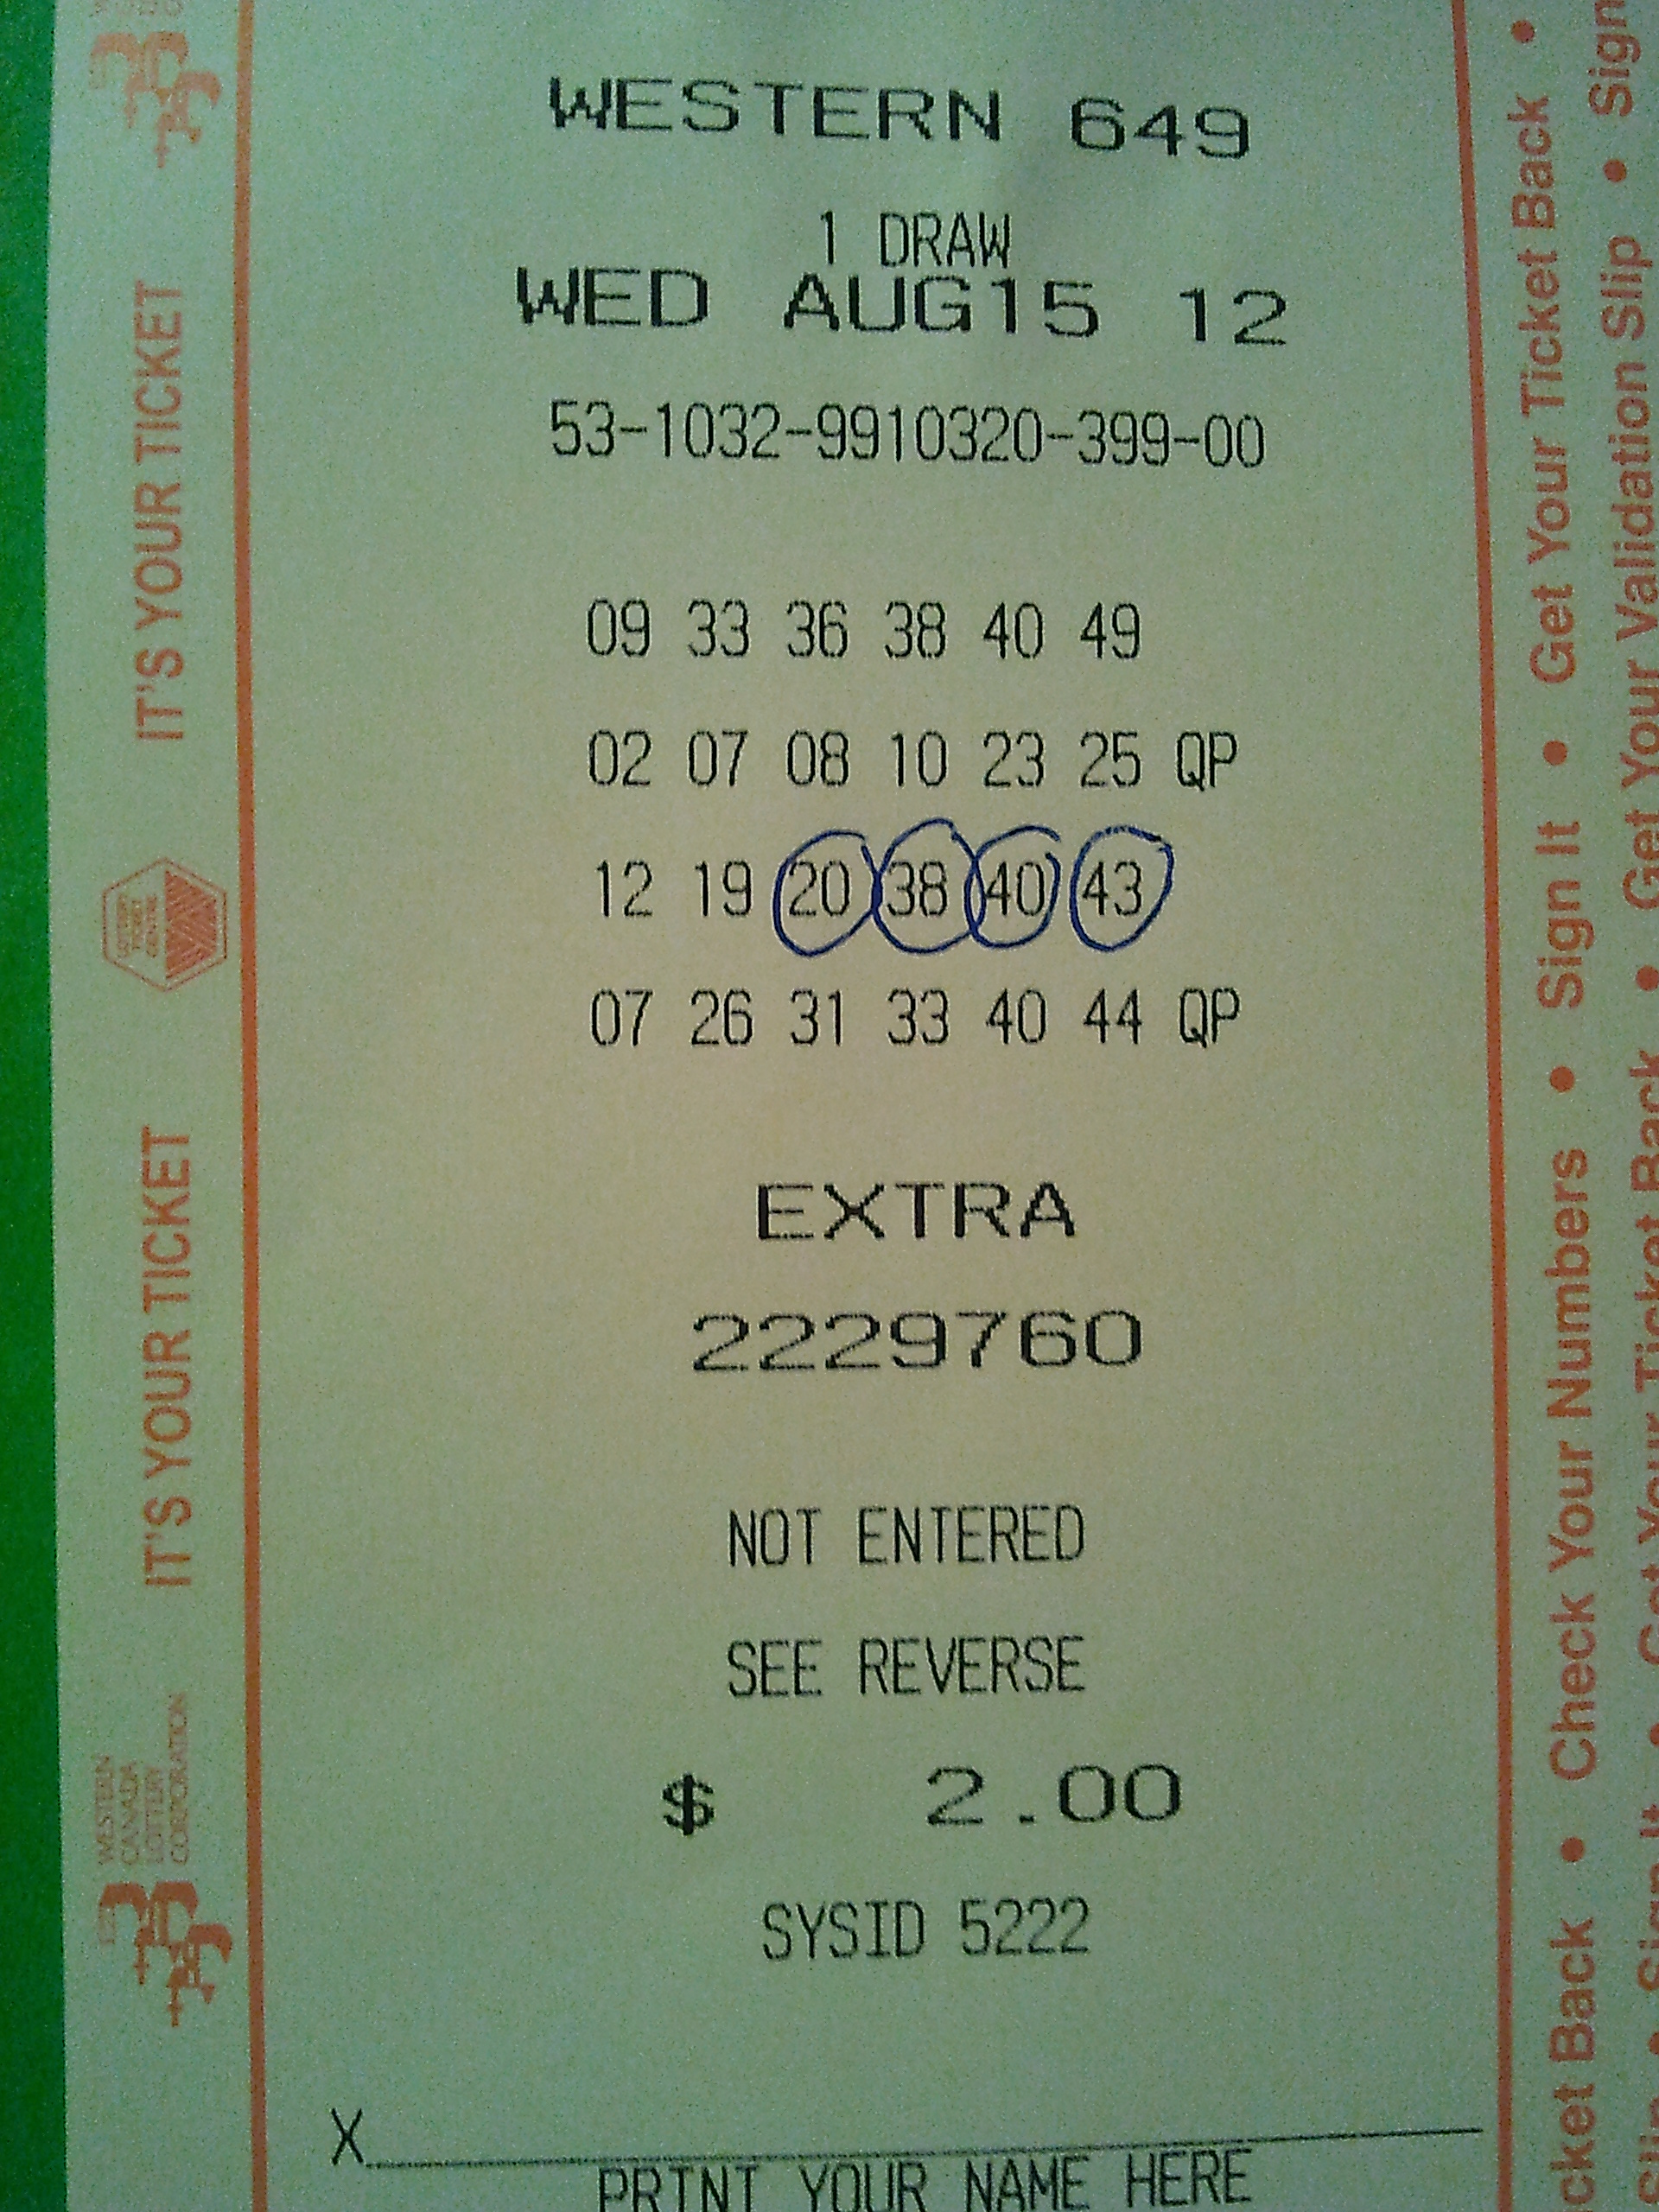 Western Lotto 649 Winning Ticket